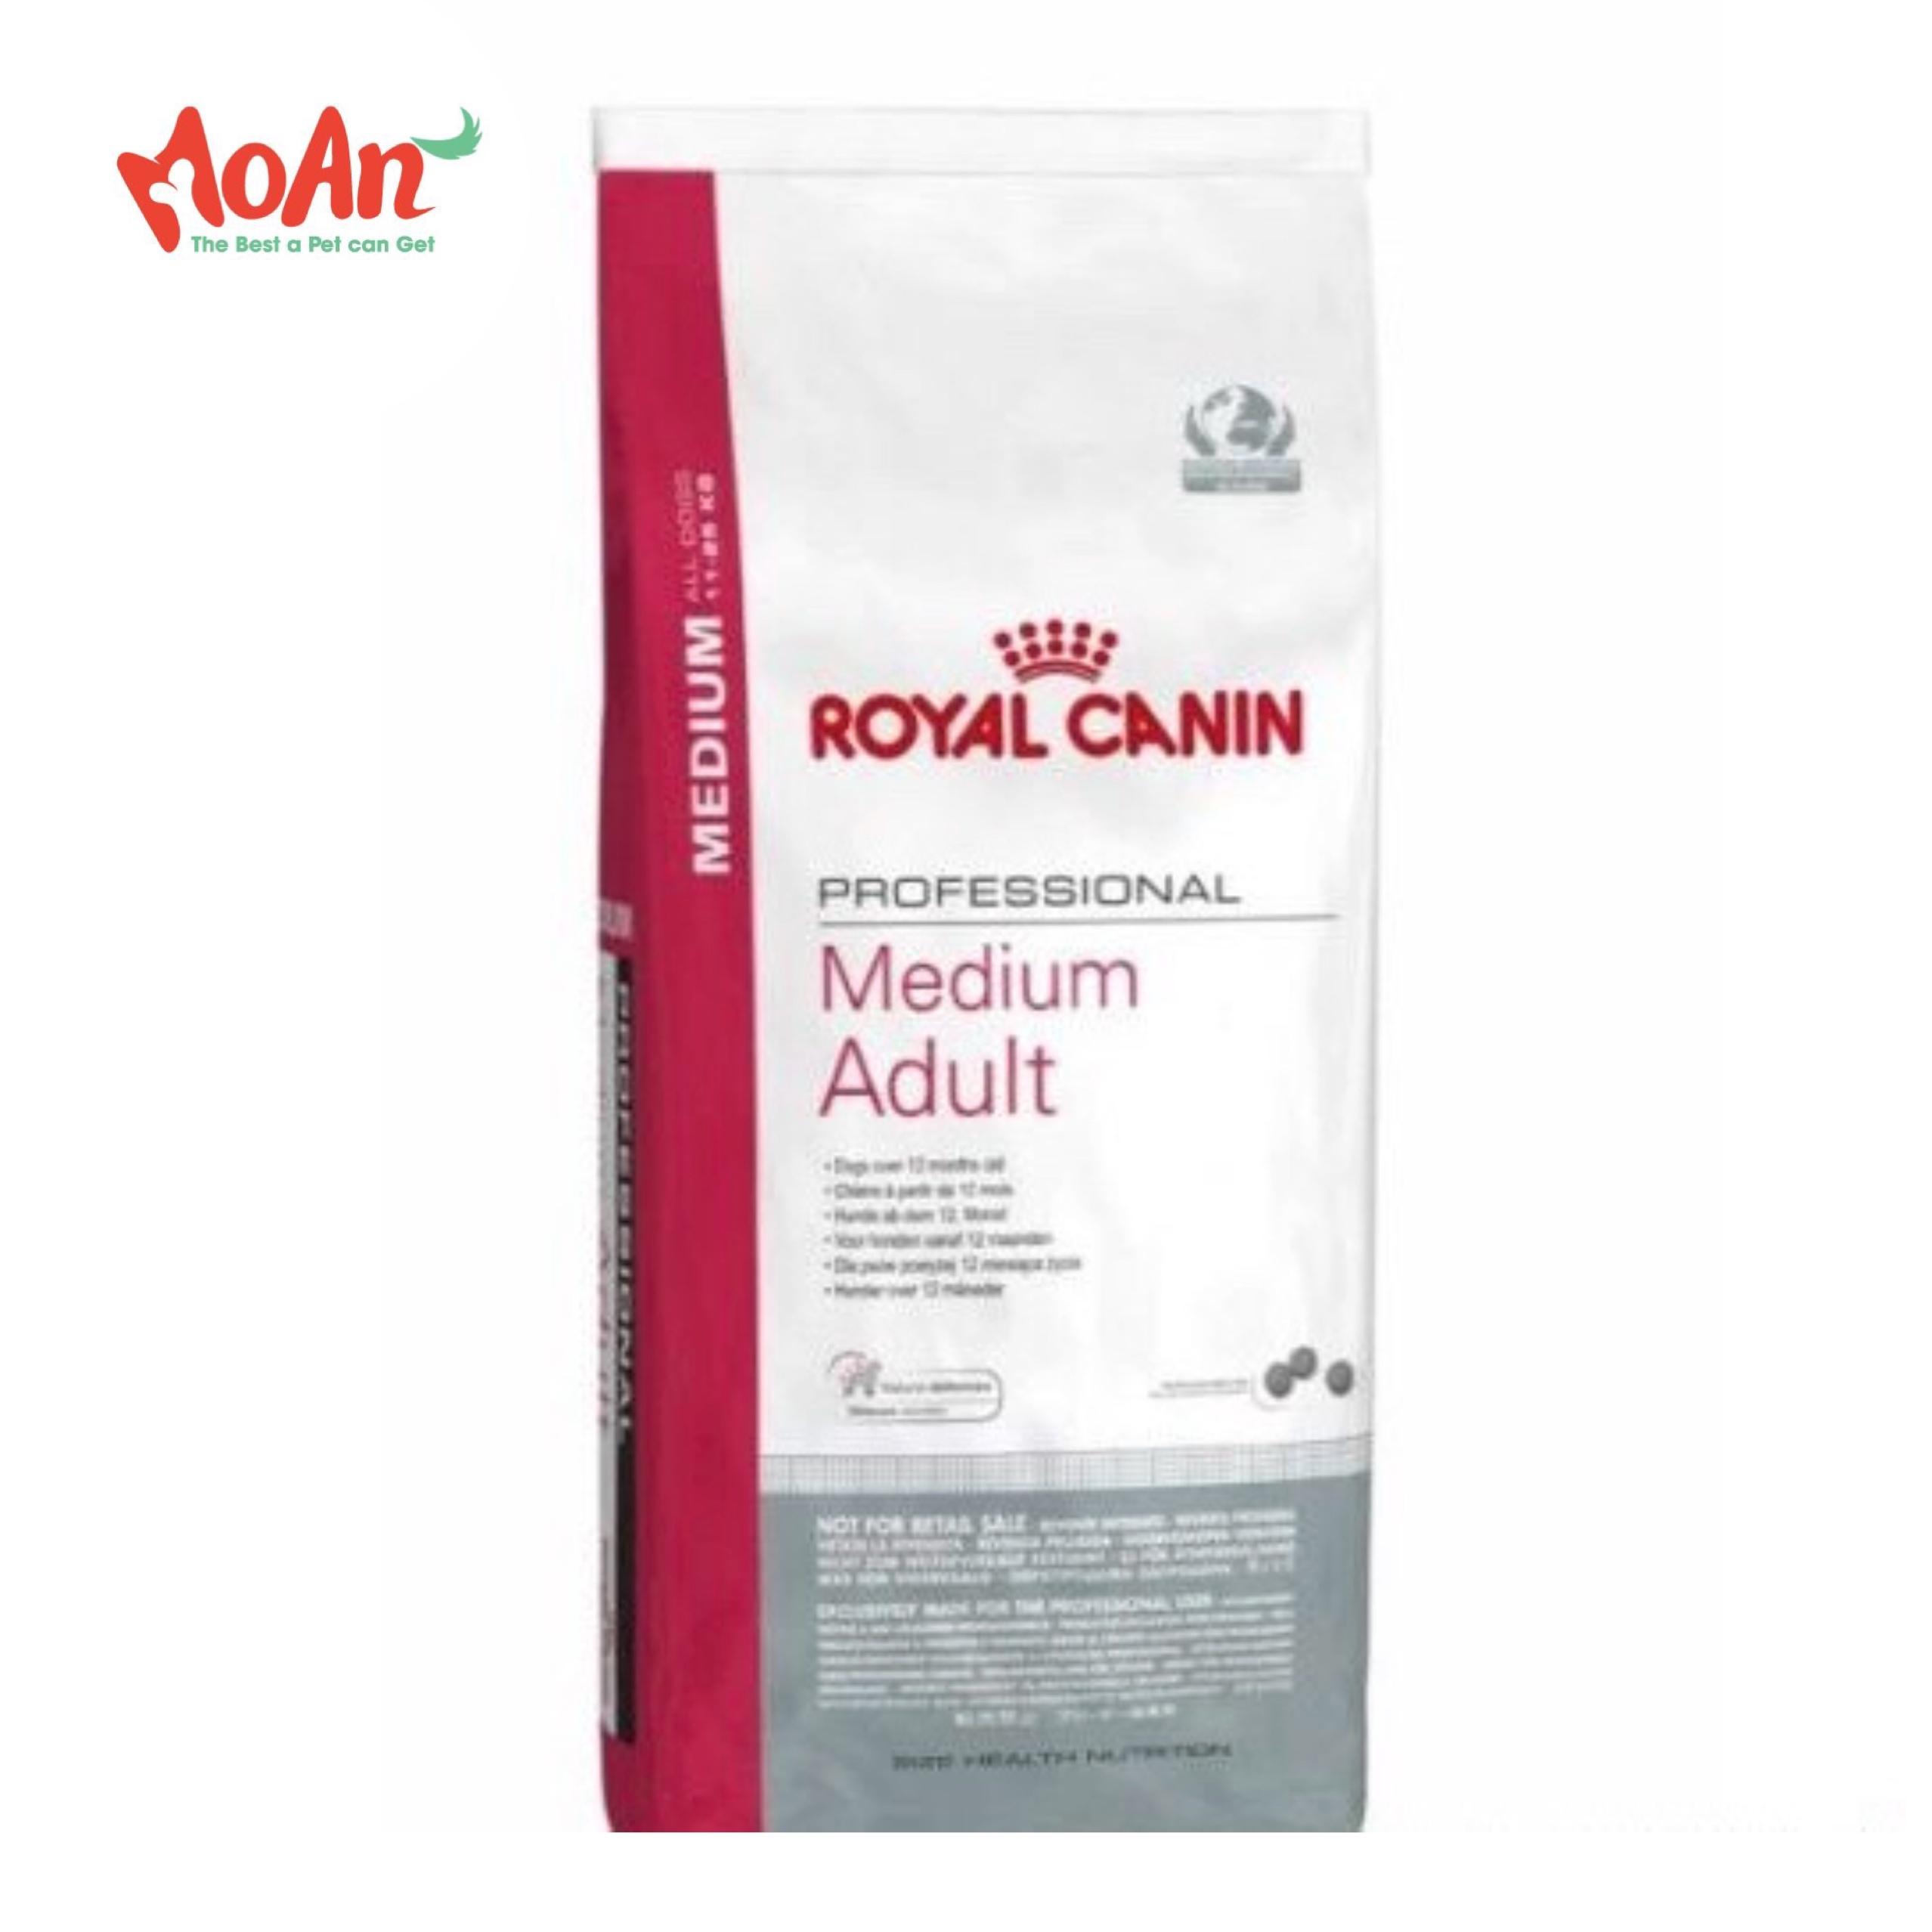 ROYAL CANIN MEDIUM ADULT 16kg